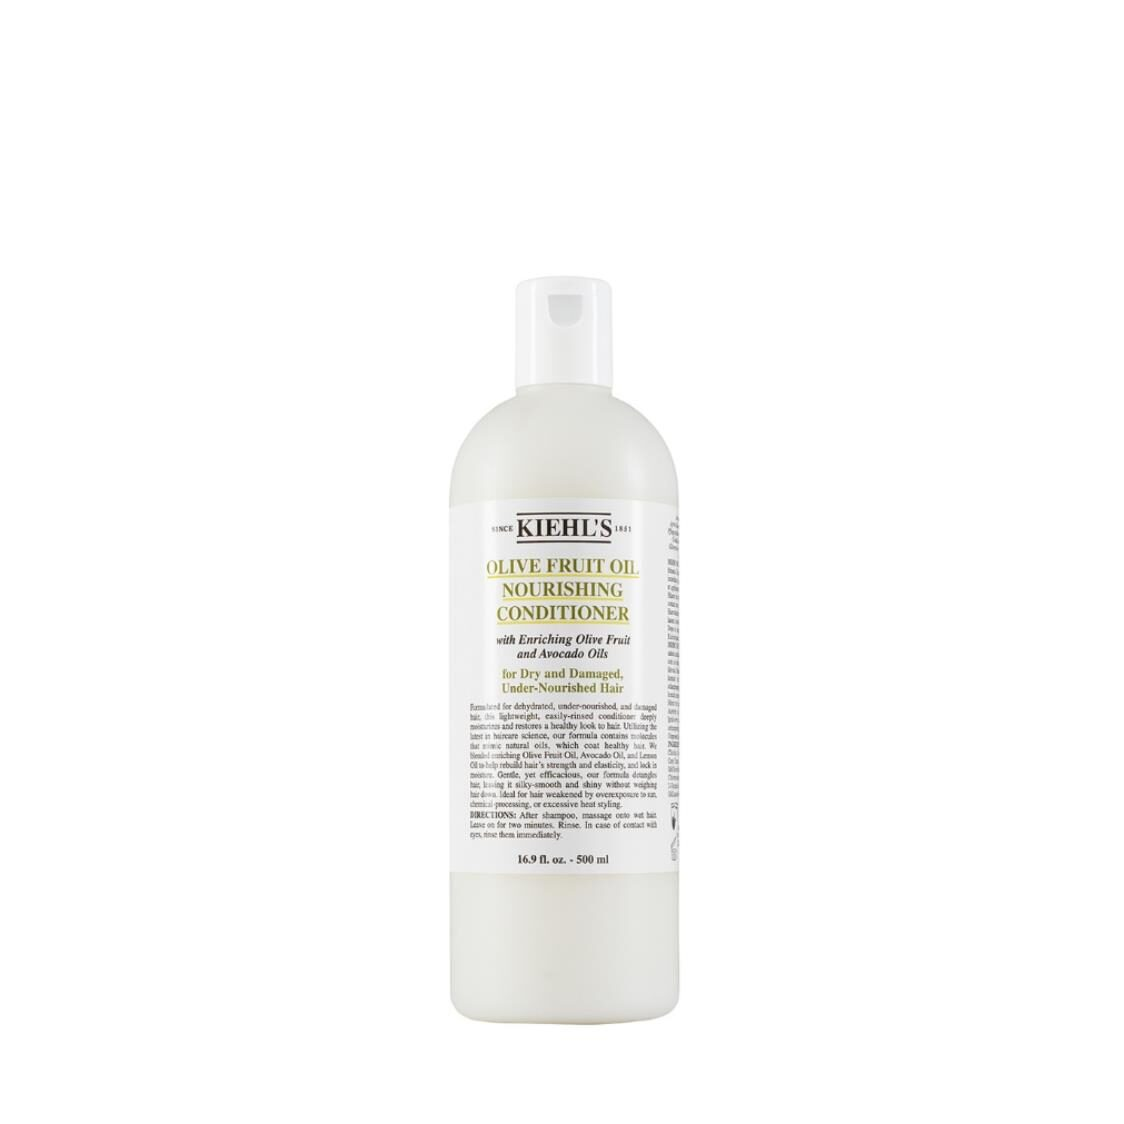 Kiehls Since 1851 Olive Fruit Oil Nourishing Conditioner 500ml